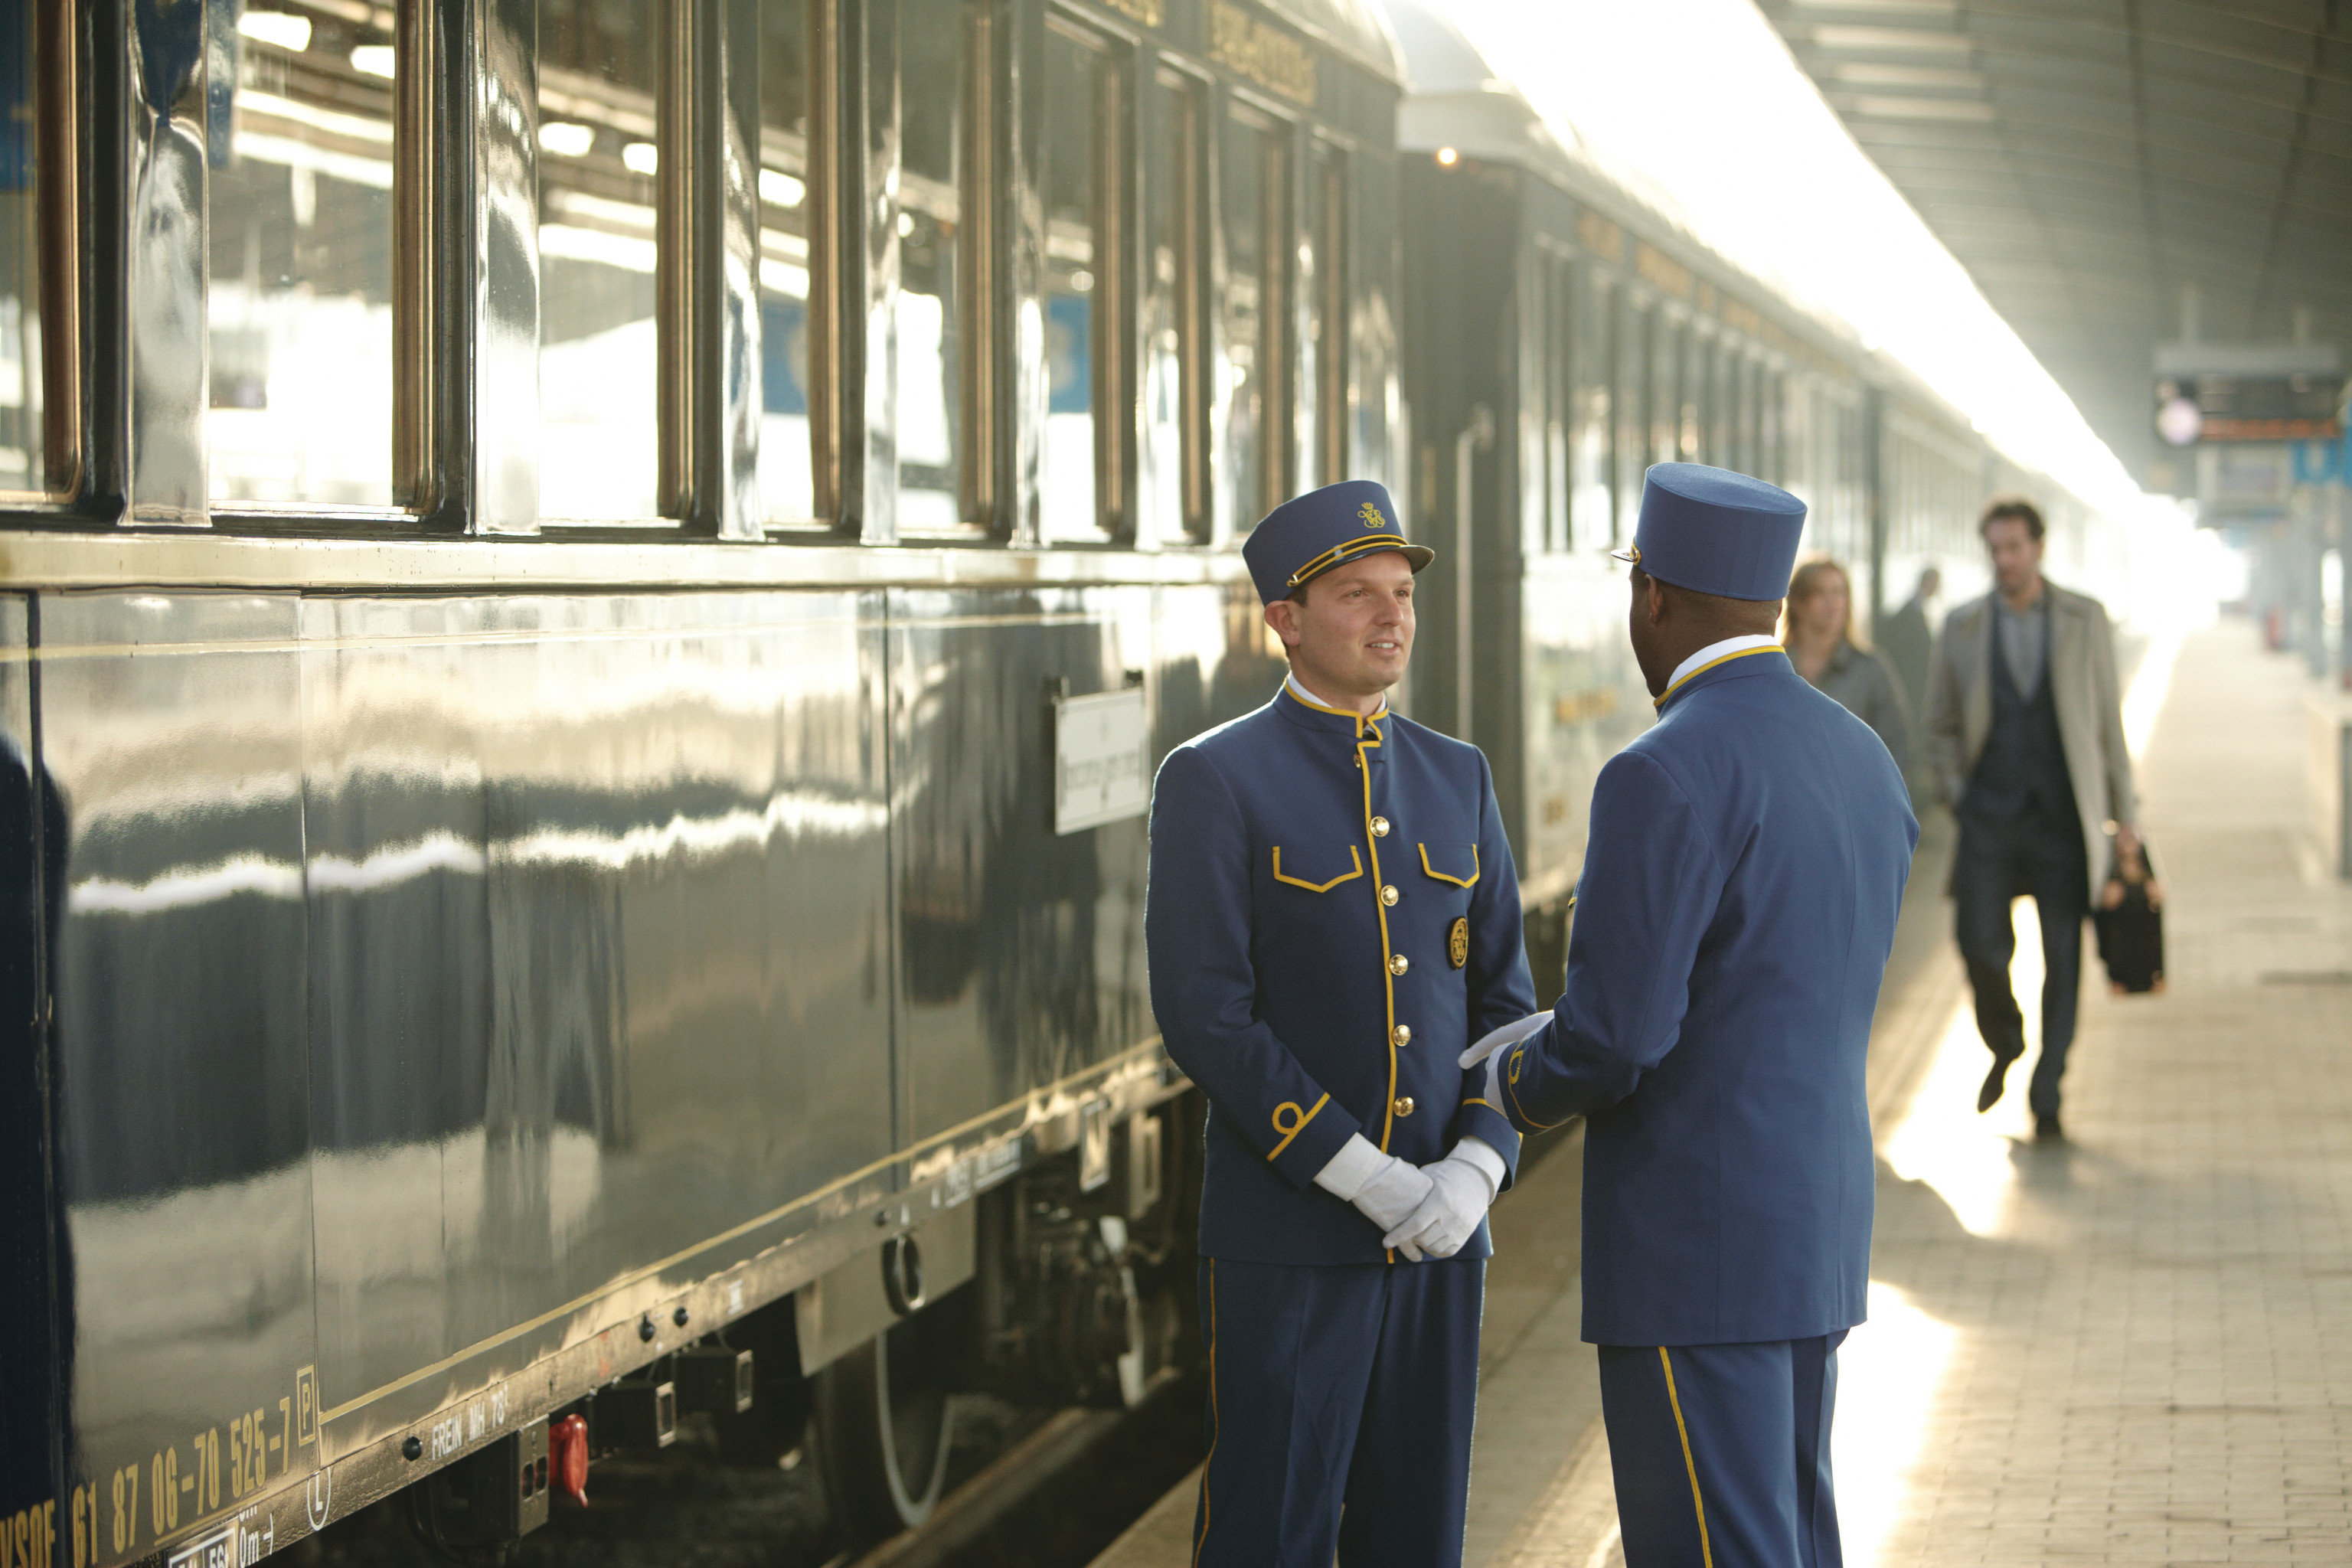 Luxury Travel Trip Ideas person transport standing train public transport passenger vehicle subway